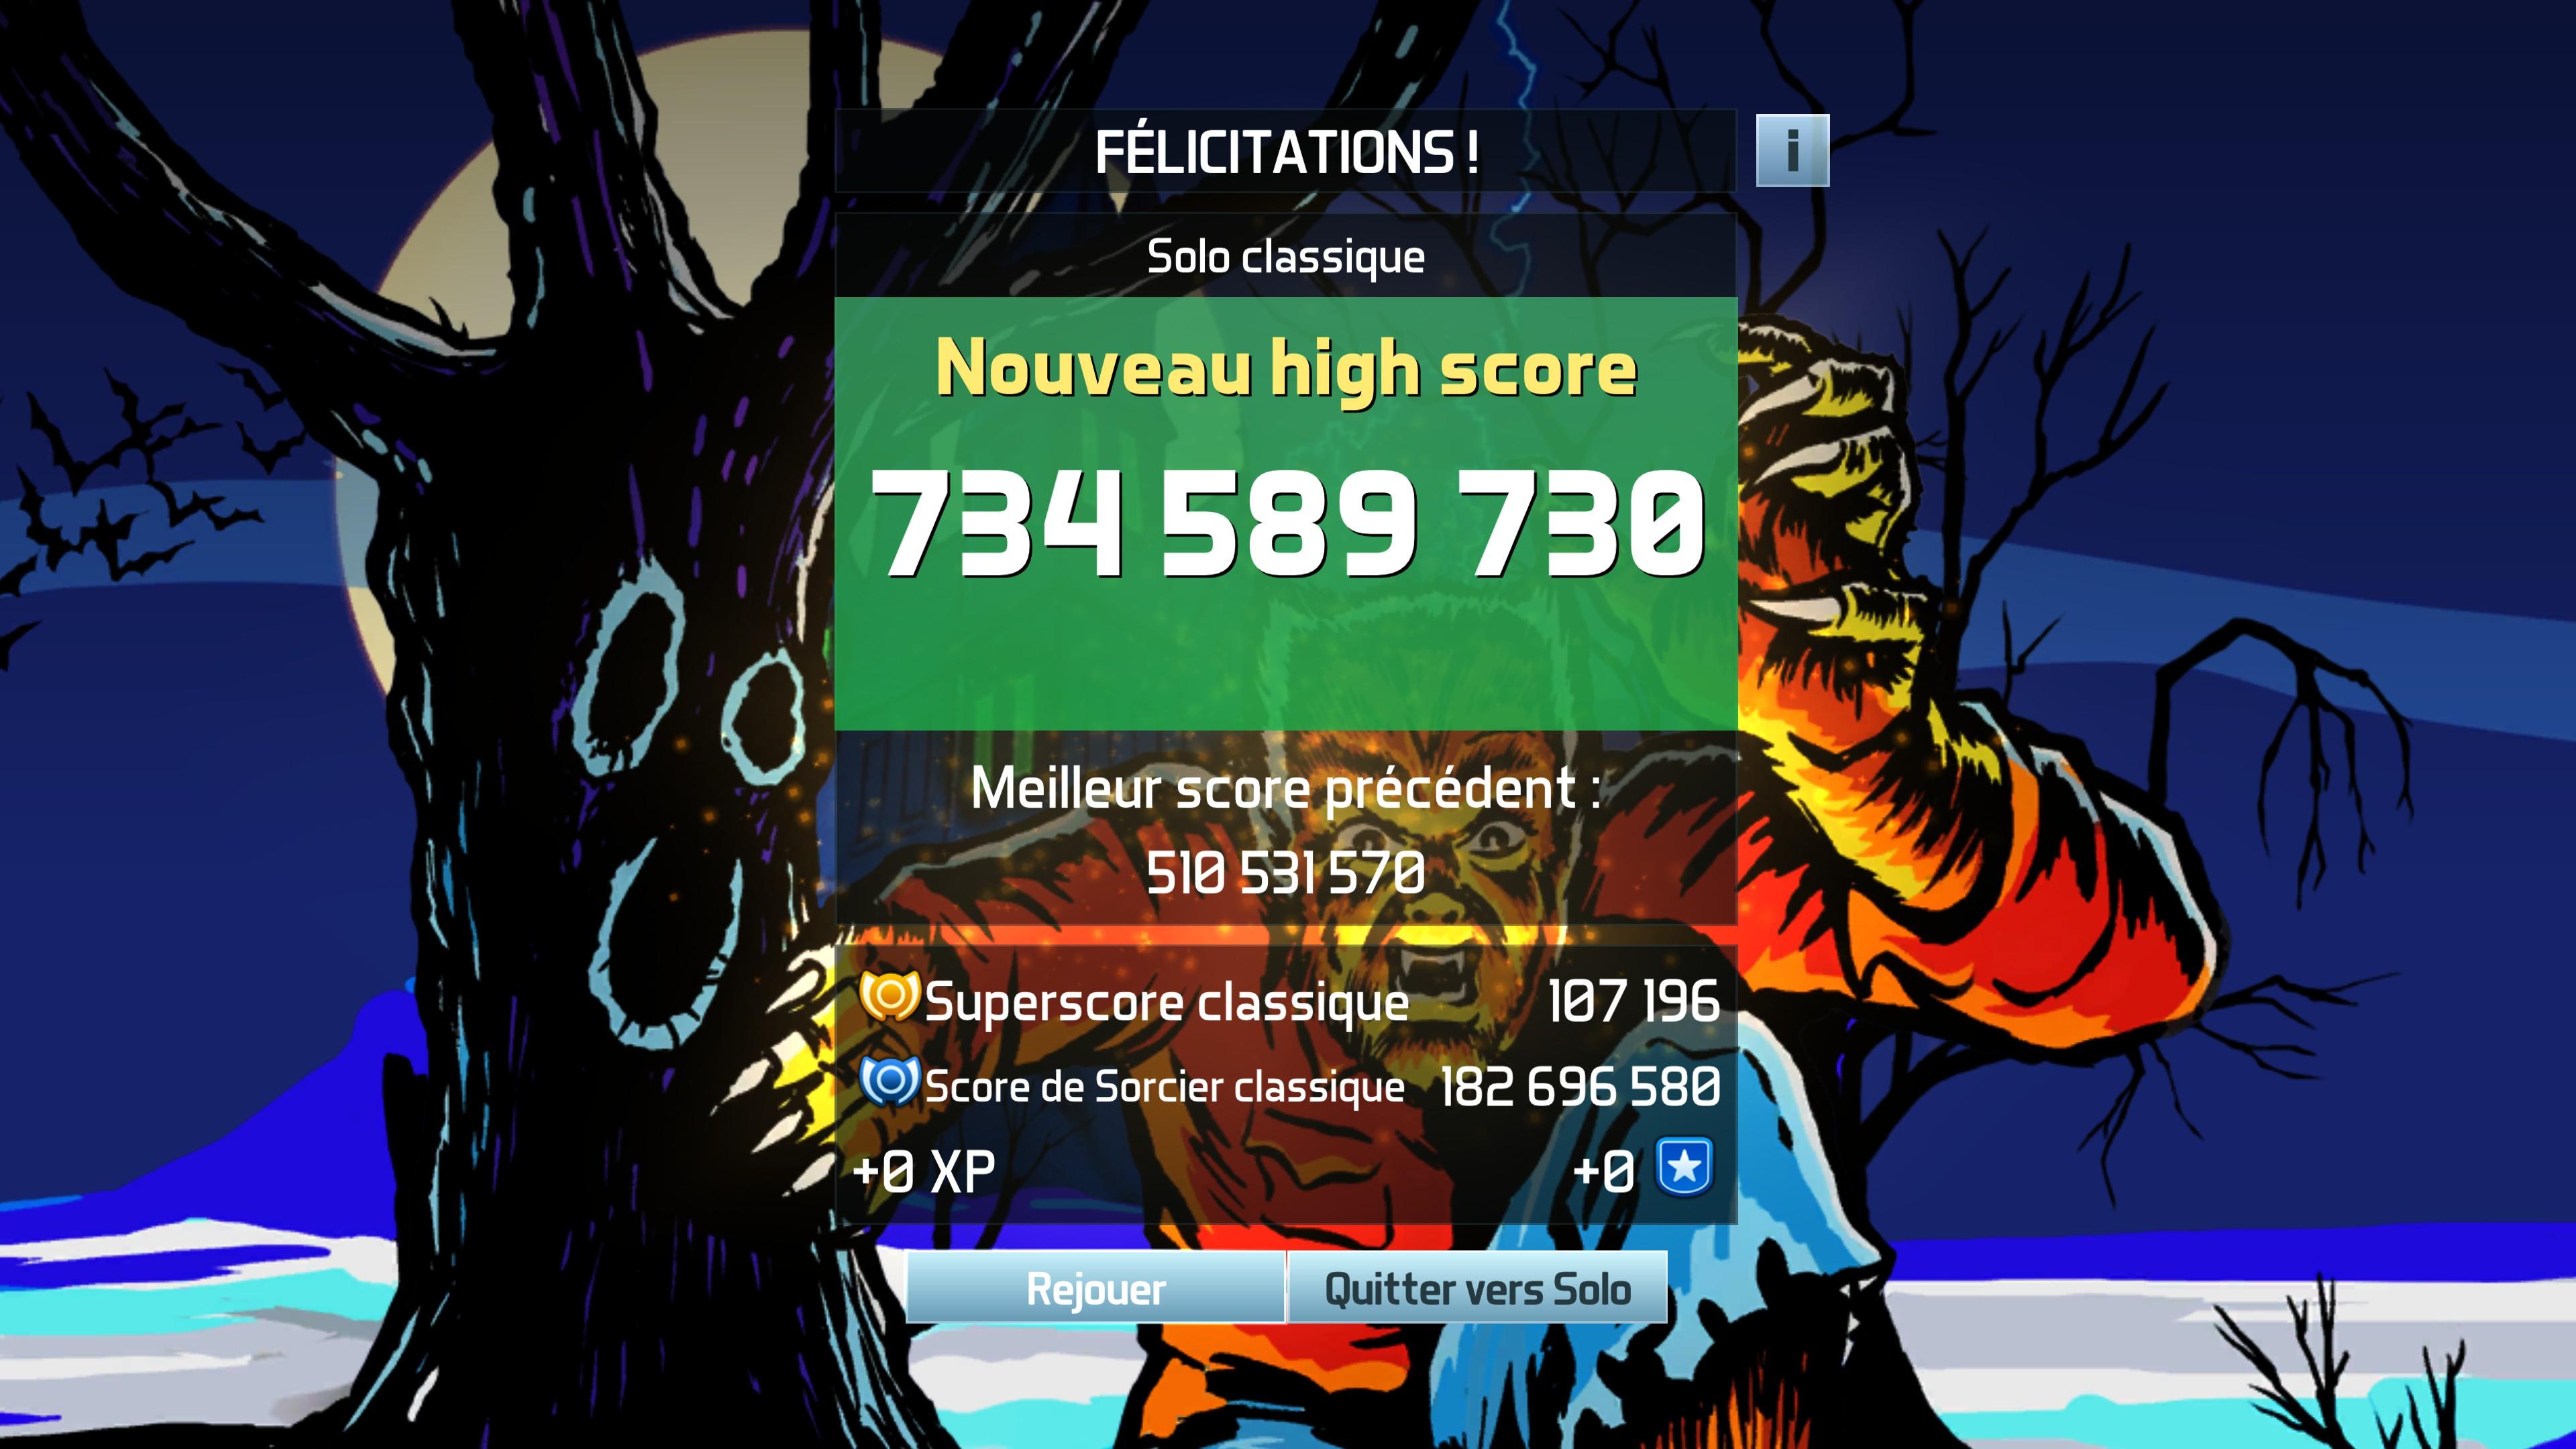 Williams Pinball : Les records du LUP's Club en mode Classique (arcade et tournoi) - Page 5 256D6AC259CFE5643B9661A482337B67ECBA99E3